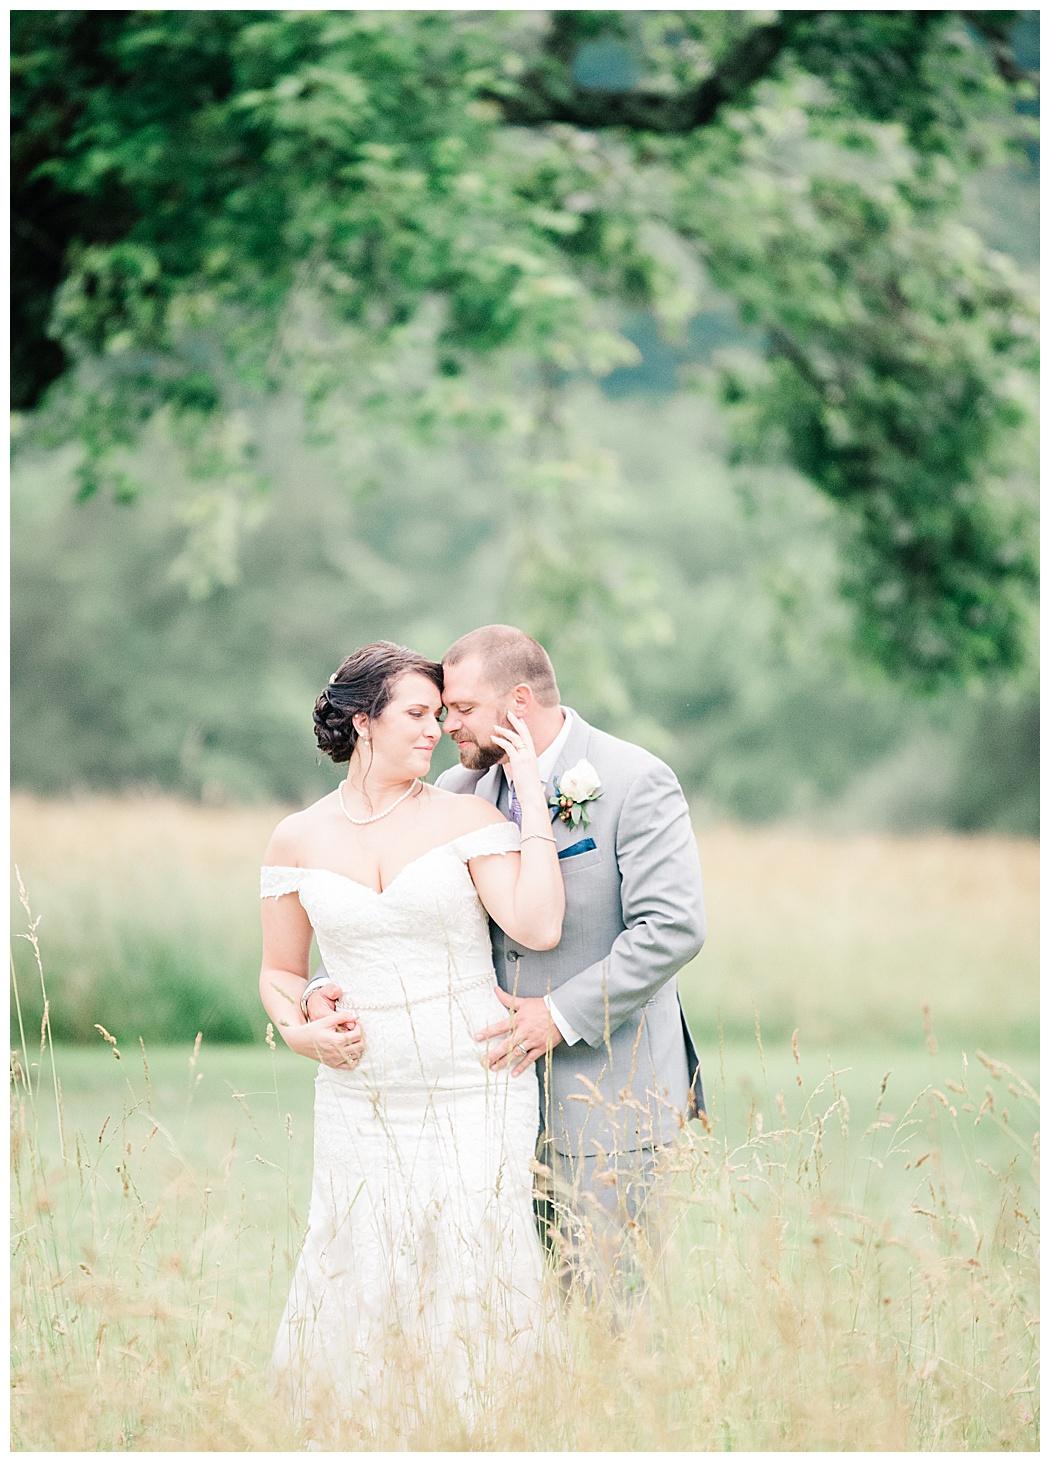 River-Uplands-Farm-Wedding-Photographer_0116.jpg